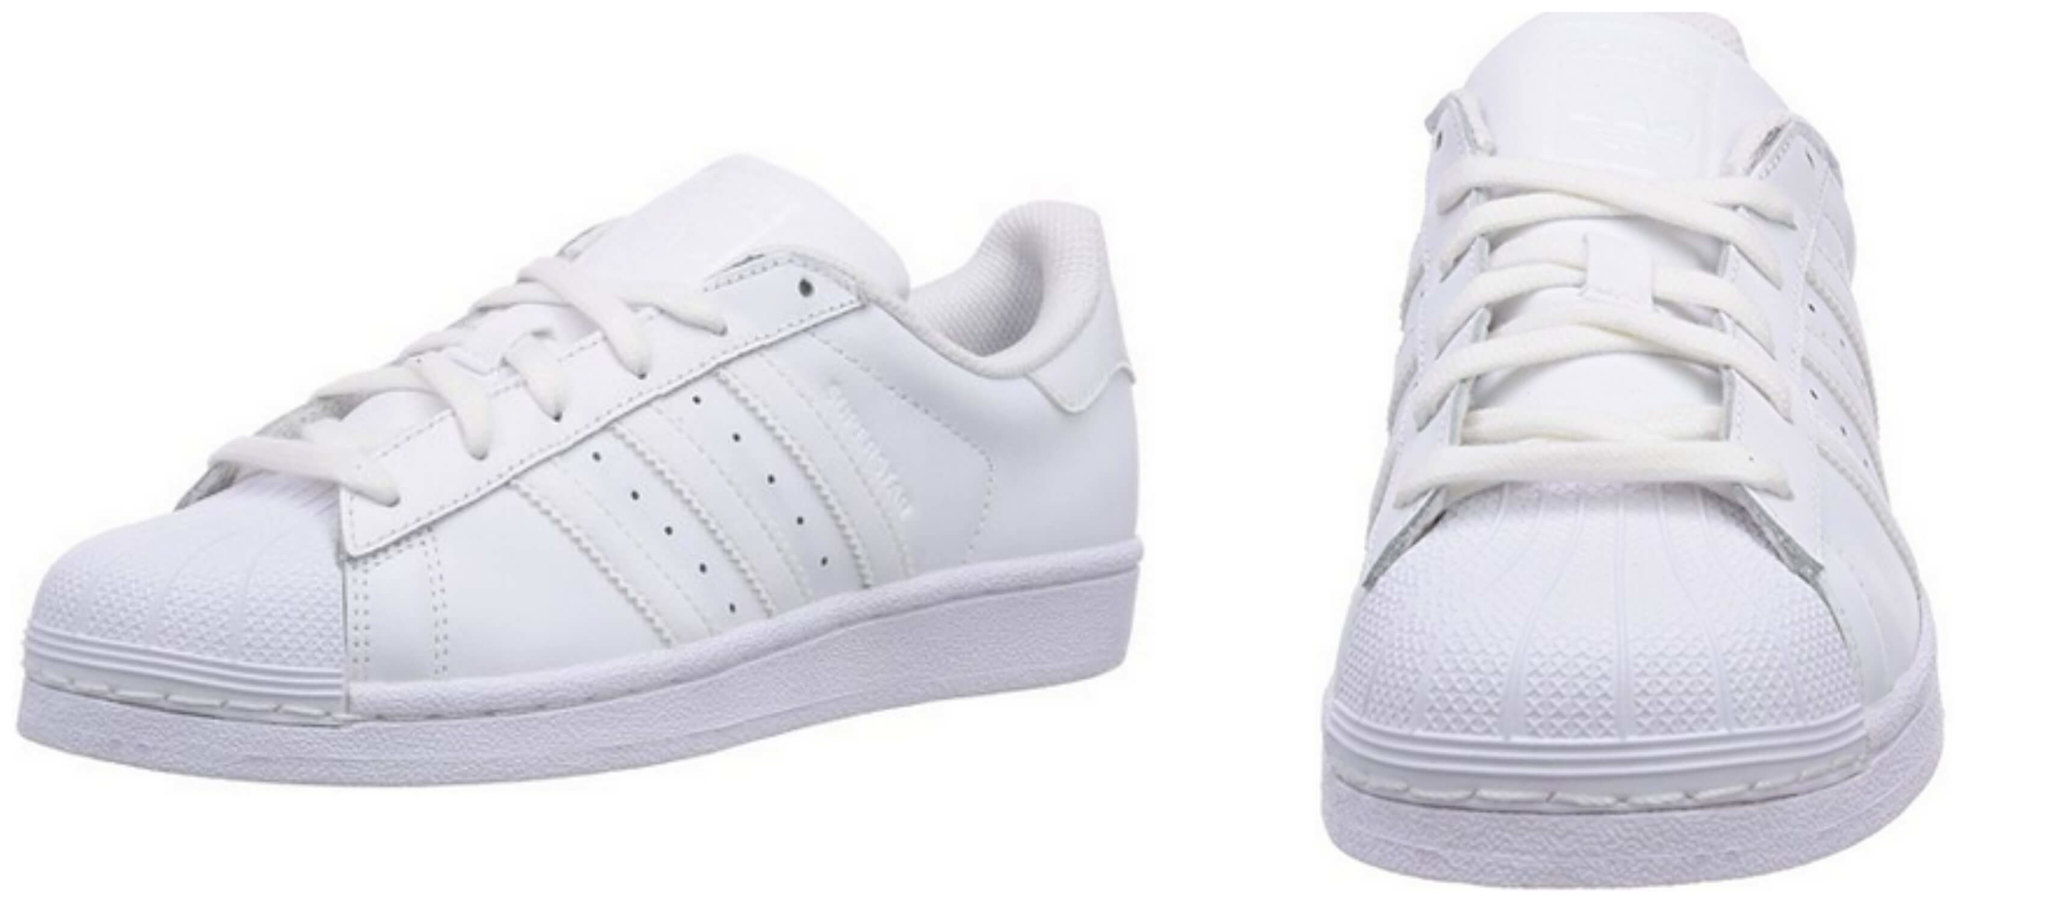 e13a25a62915b ▷   Mejores Adidas Superstar  mas baratas del mercado